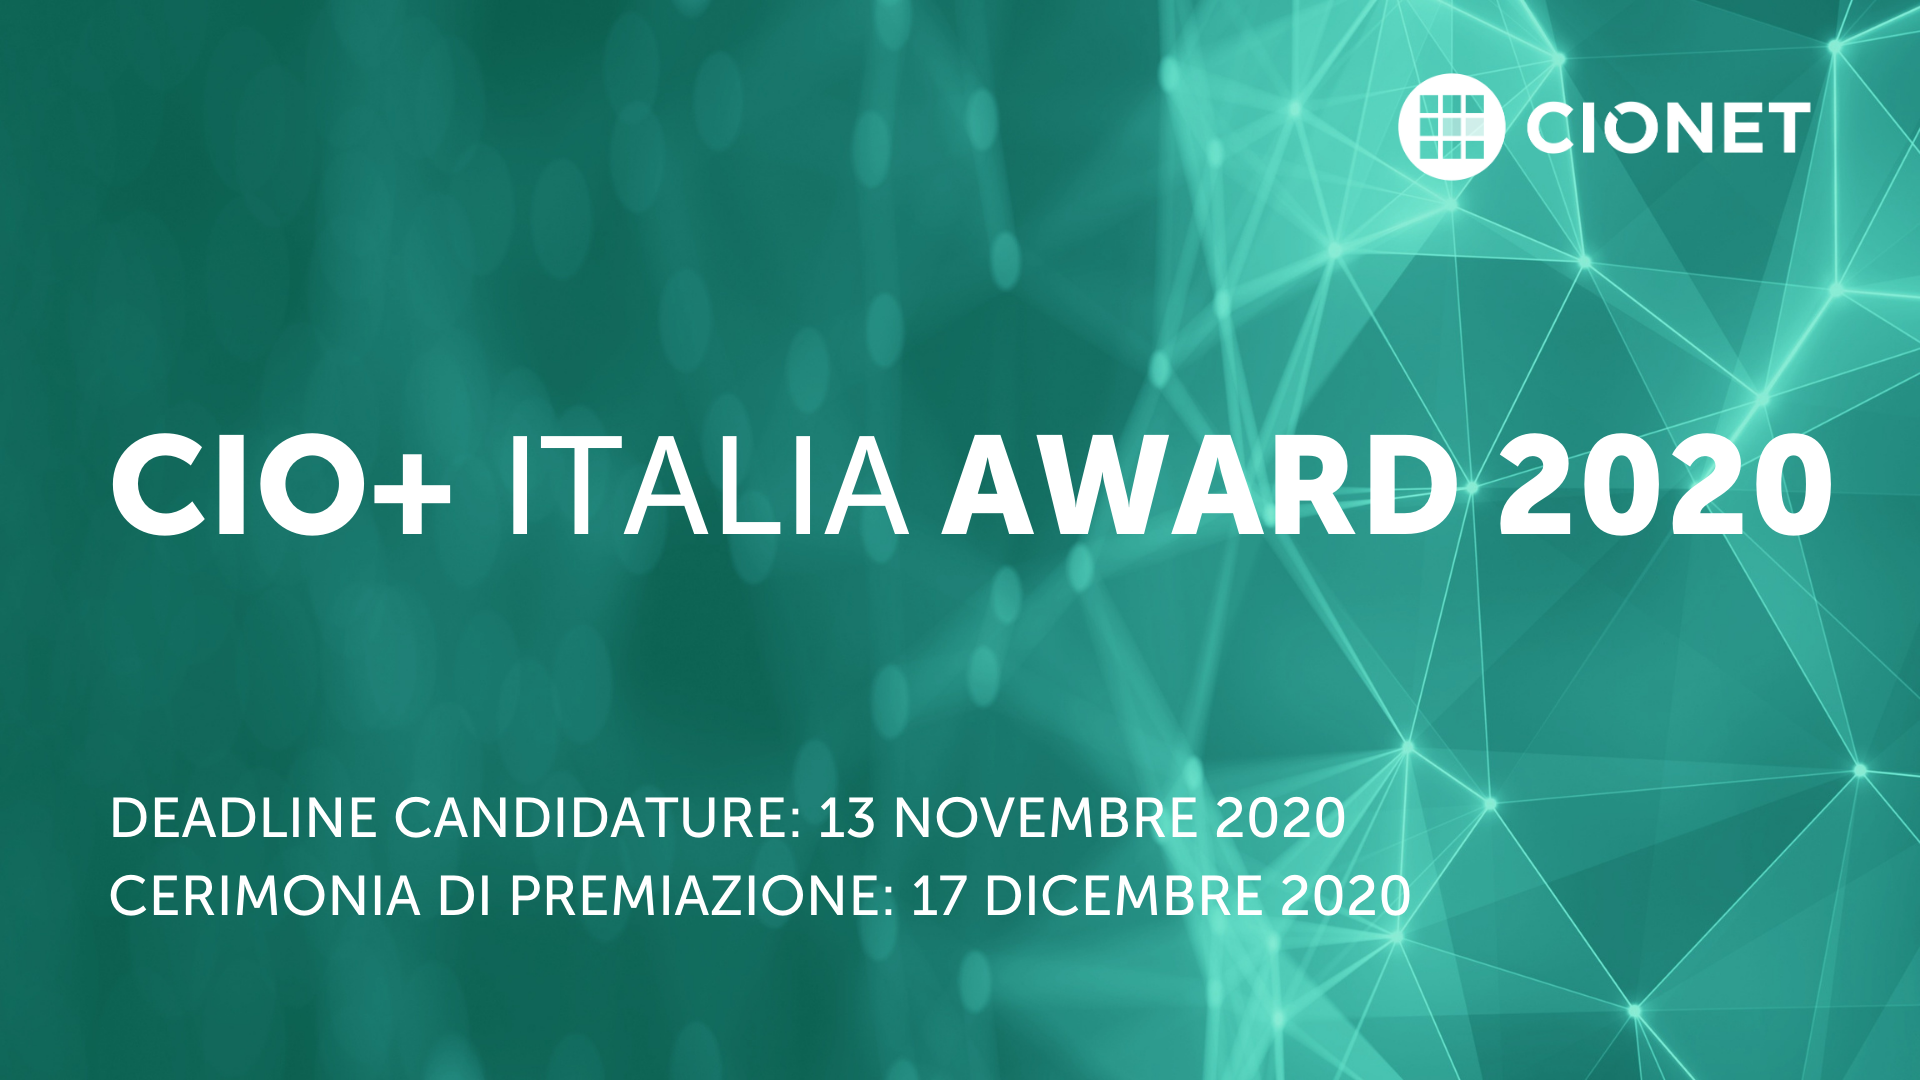 Copy of CIO+ ITALIA AWARD 2020 (2)